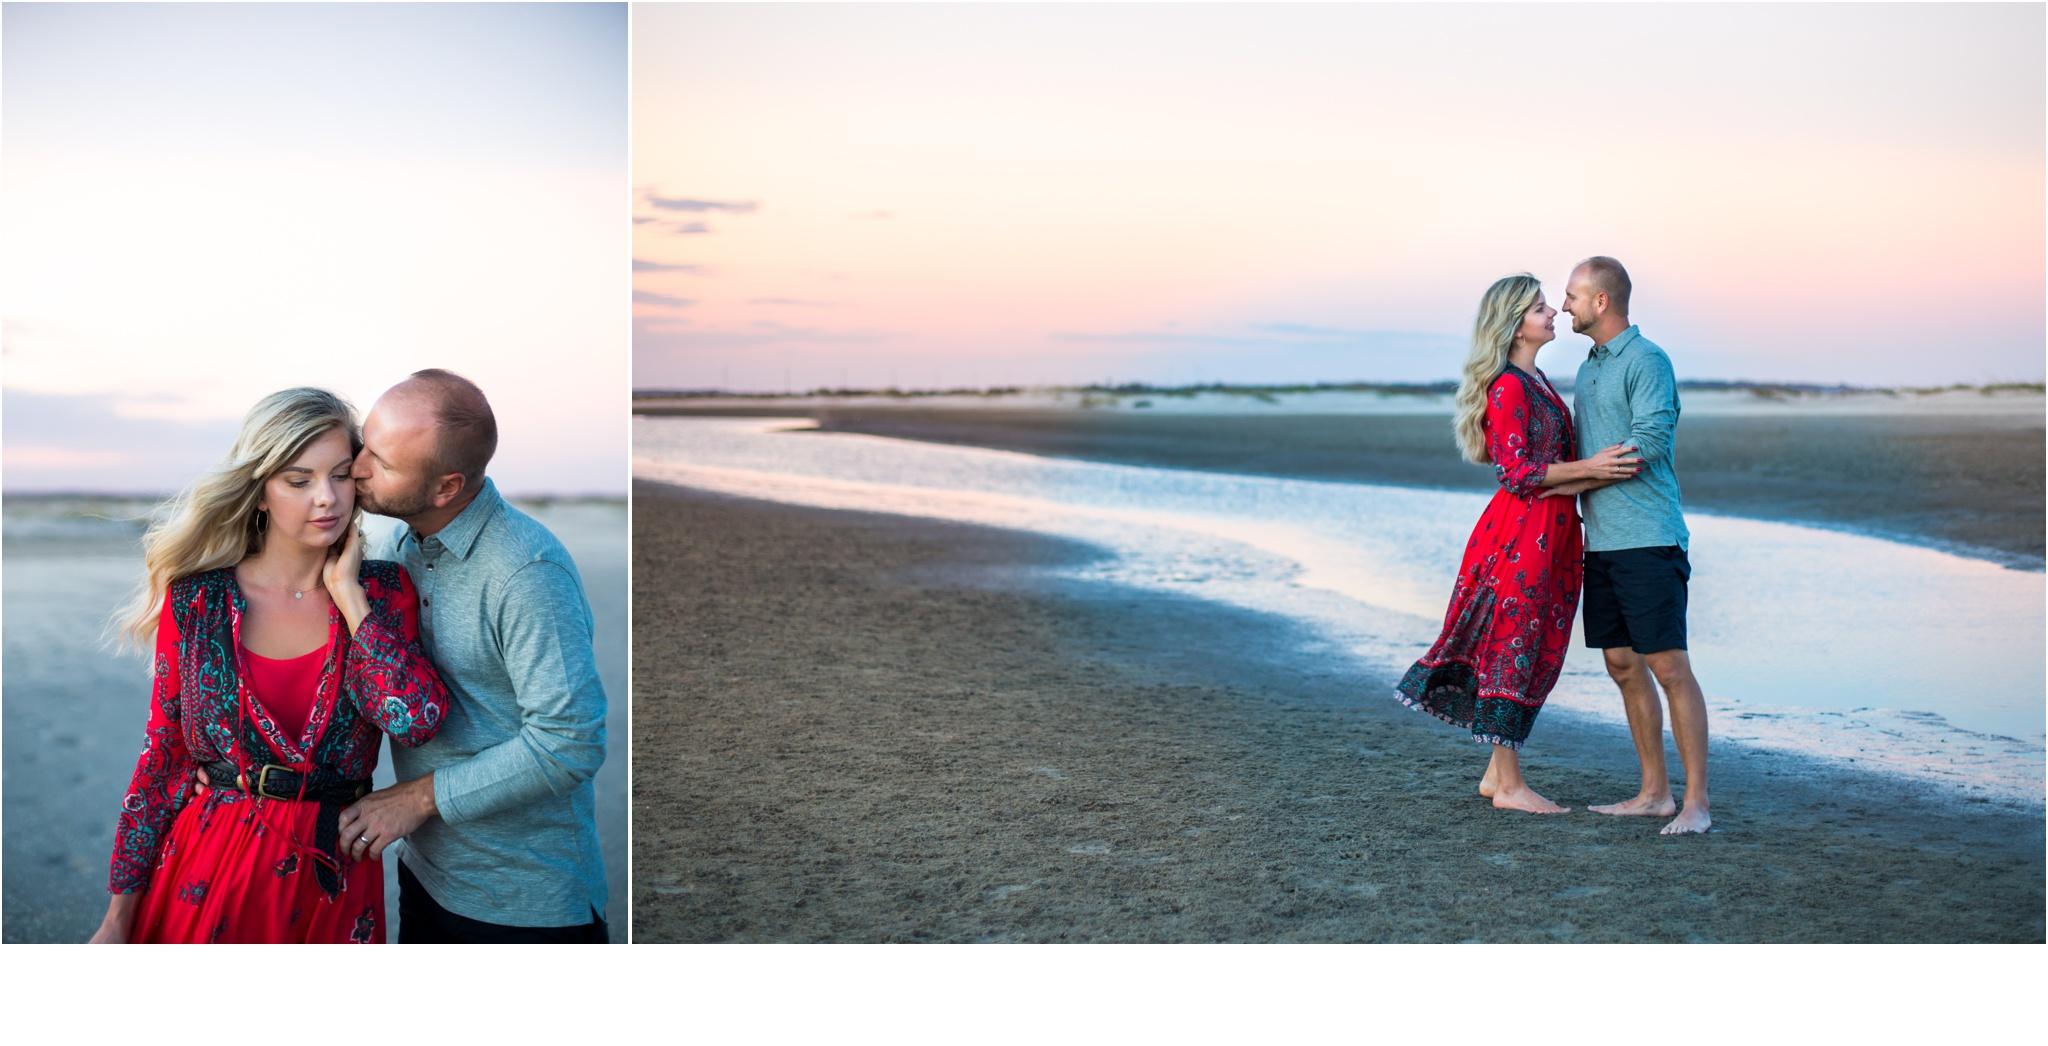 Rainey_Gregg_Photography_St._Simons_Island_Georgia_California_Wedding_Portrait_Photography_0274.jpg